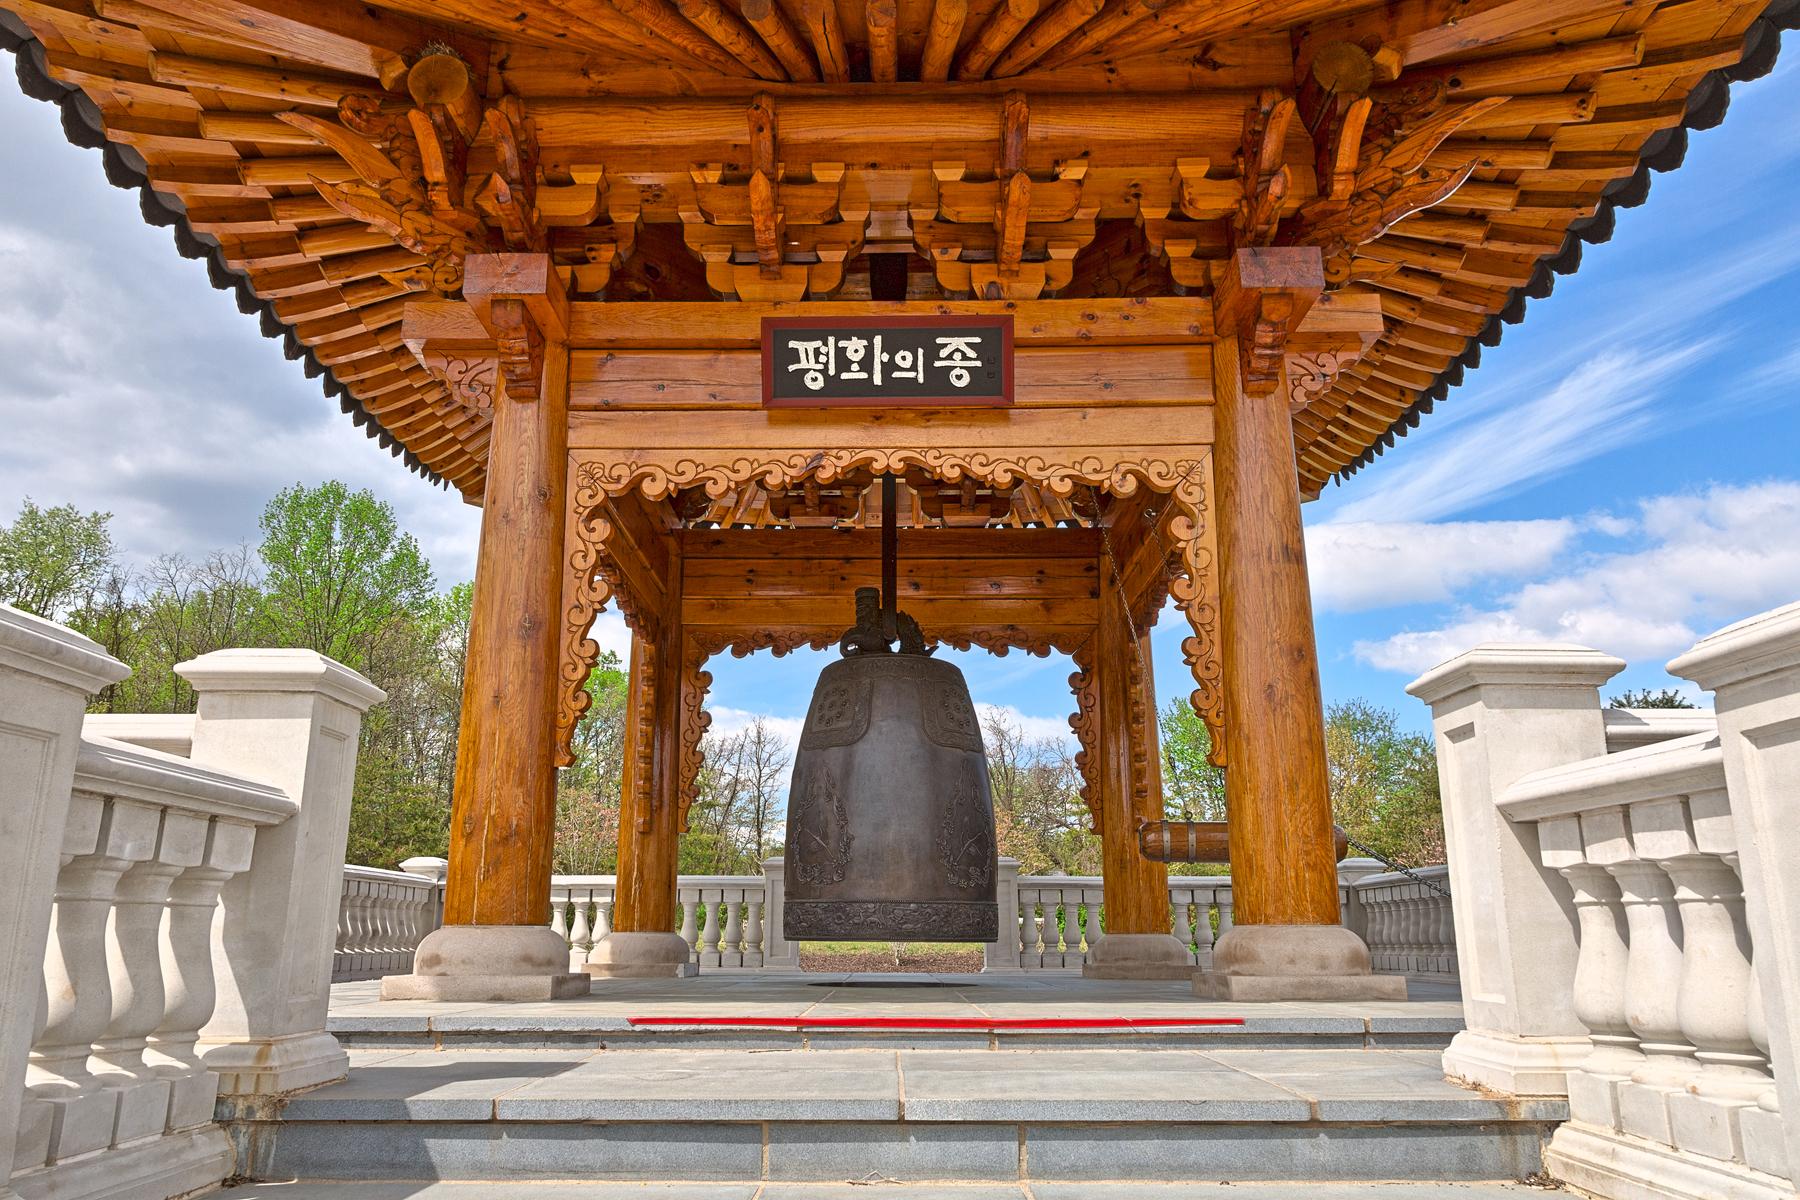 Korean bell building - hdr photo